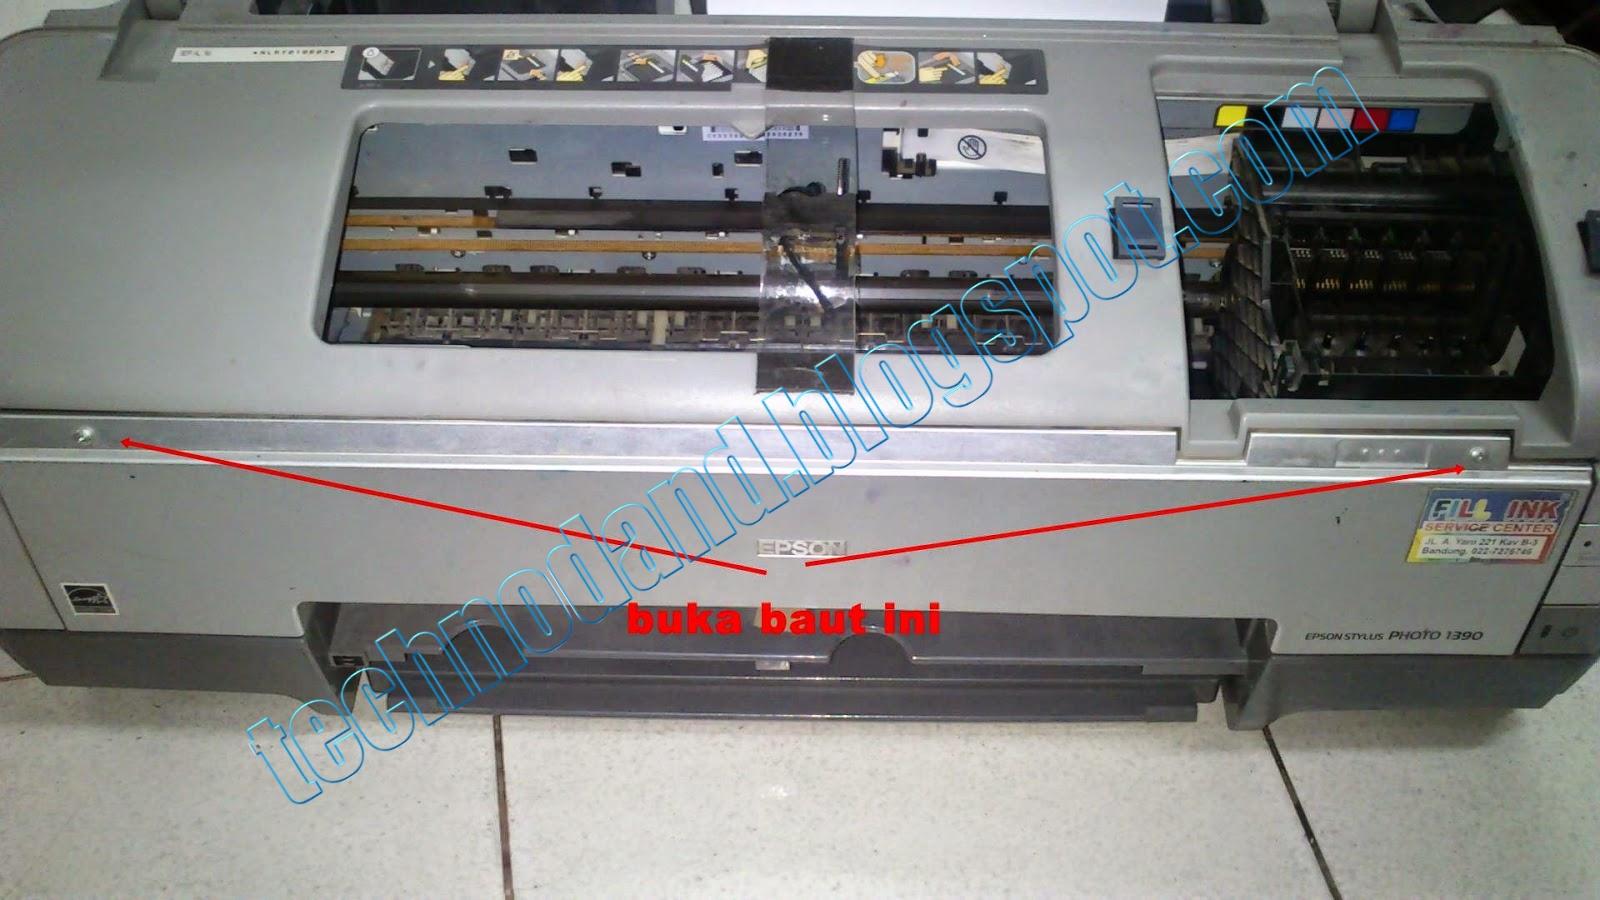 Epson Stylus Photo 1390 Adjustment Program Free Download Epson photo 1390 resetter